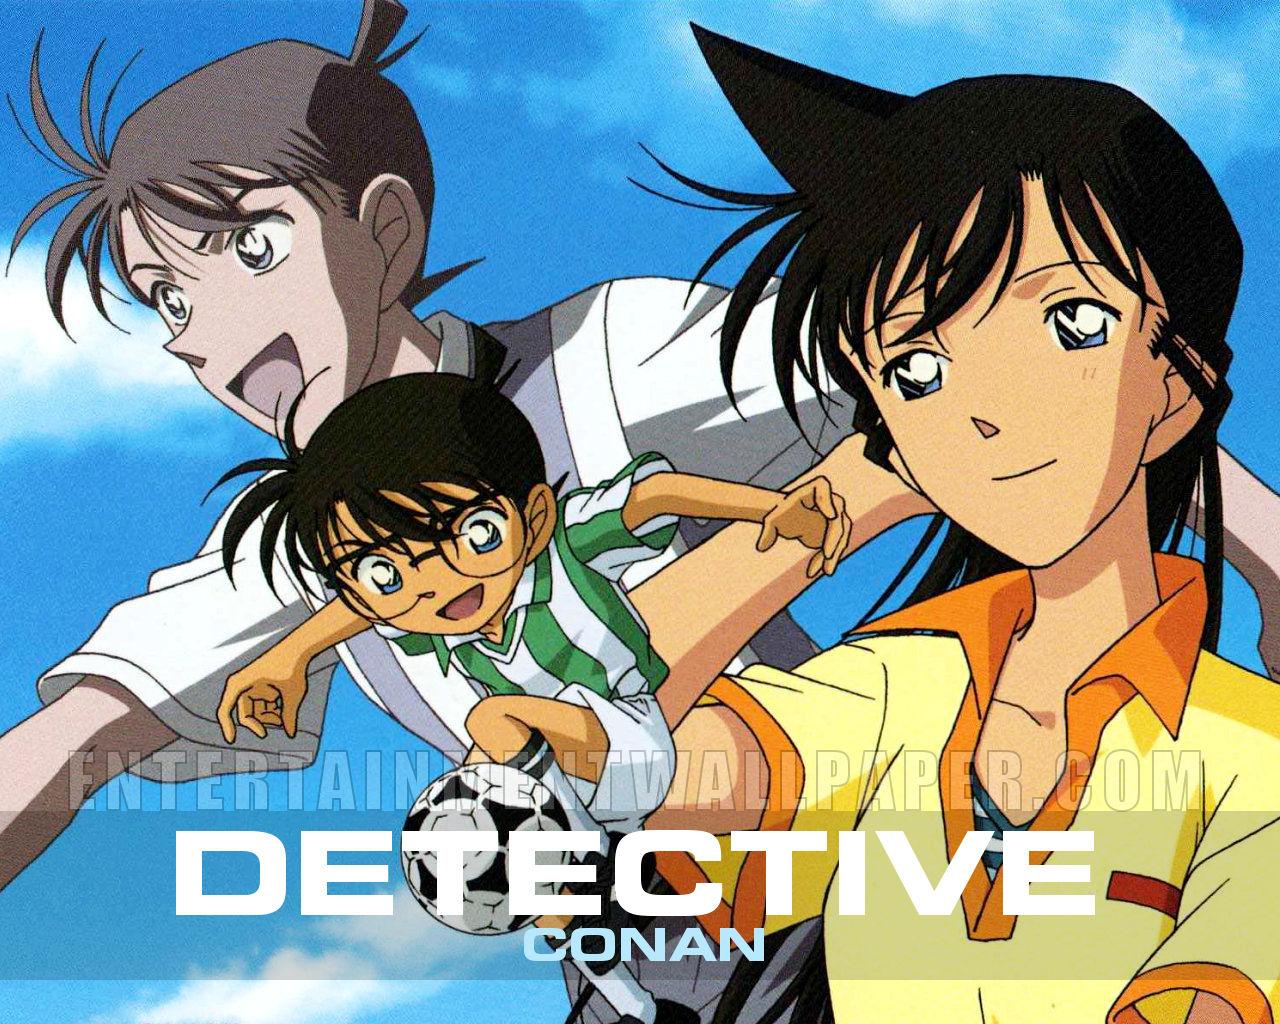 http://4.bp.blogspot.com/-XG3zNSd5mMc/UOZUJGeBPTI/AAAAAAAAAOo/3xTkPxgO54E/s1600/Detective-Conan-Wallpaper-5.jpg